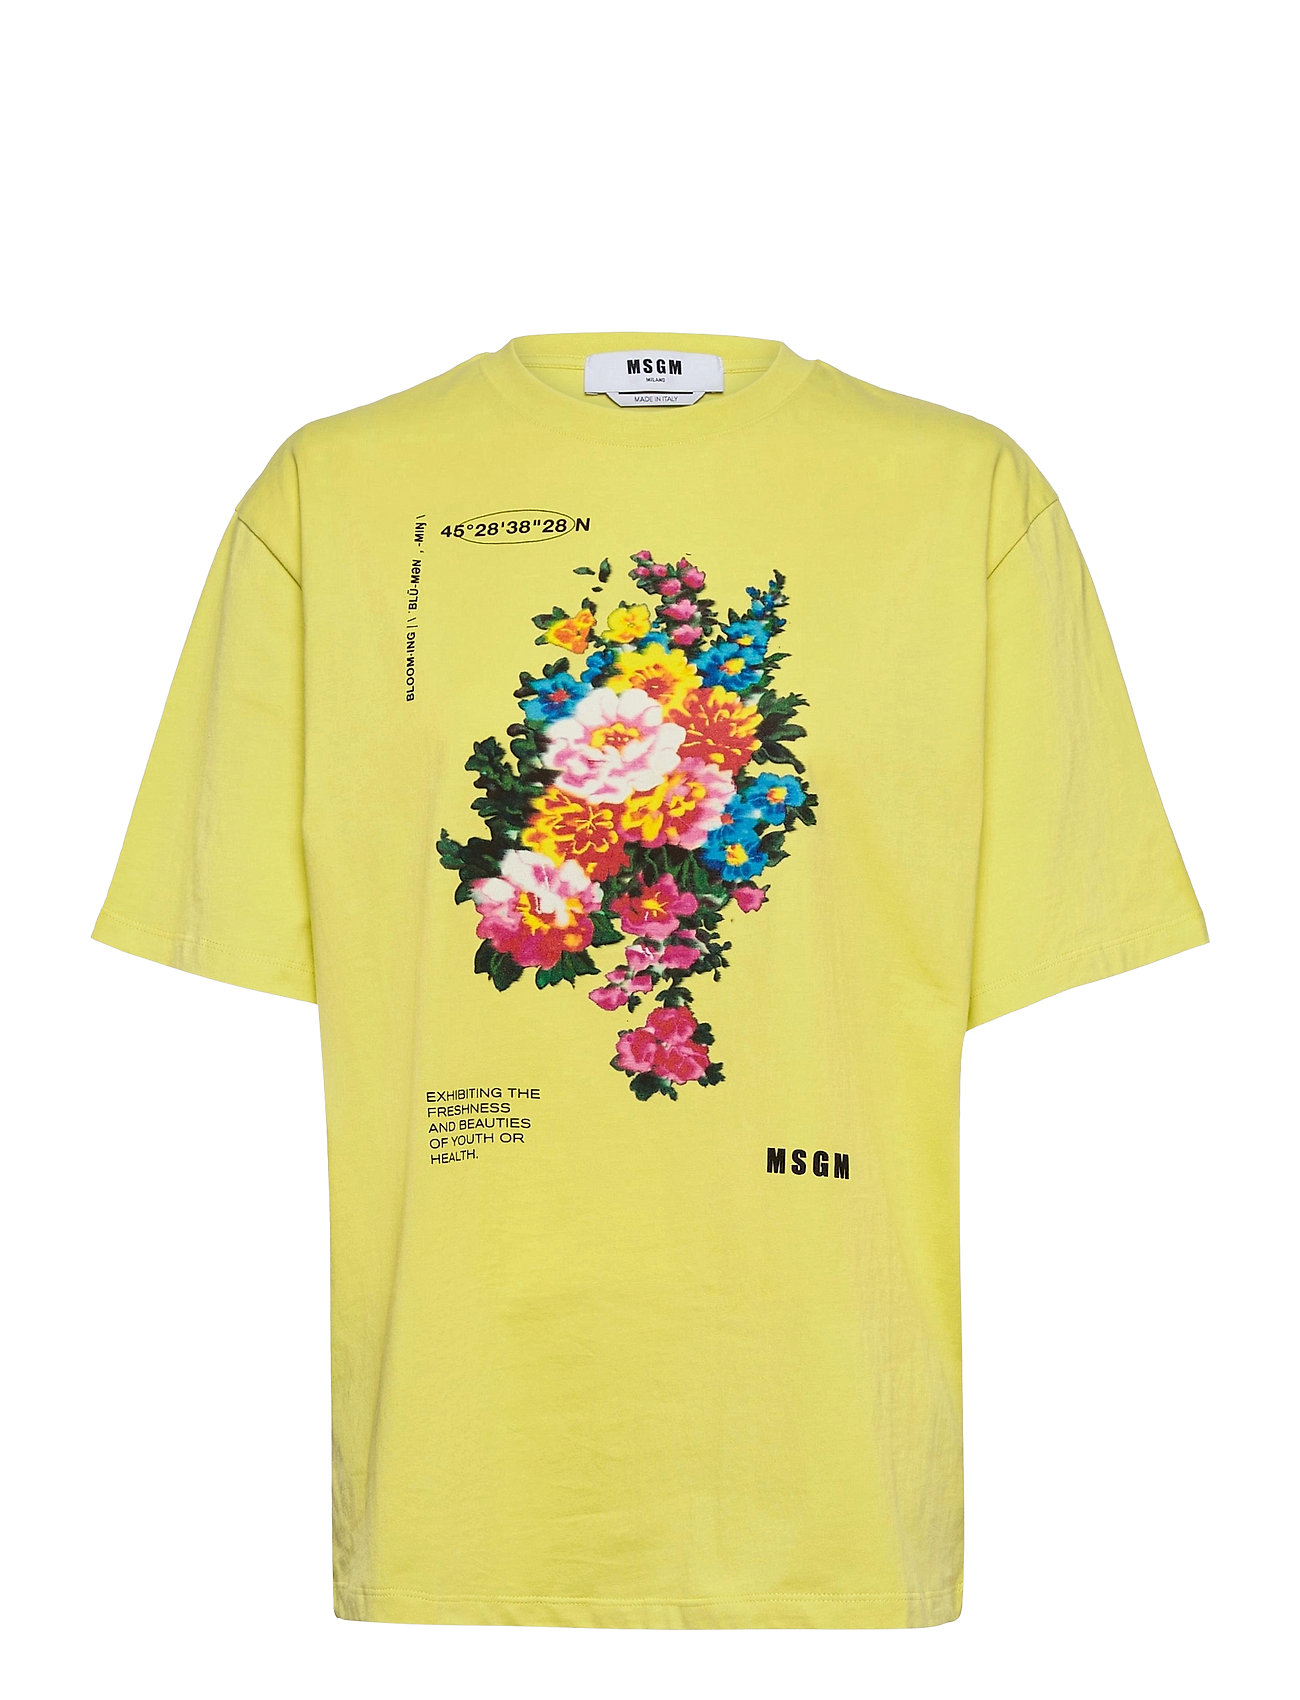 Image of T-Shirt/T-Shirt T-shirt Top Gul MSGM (3493874841)